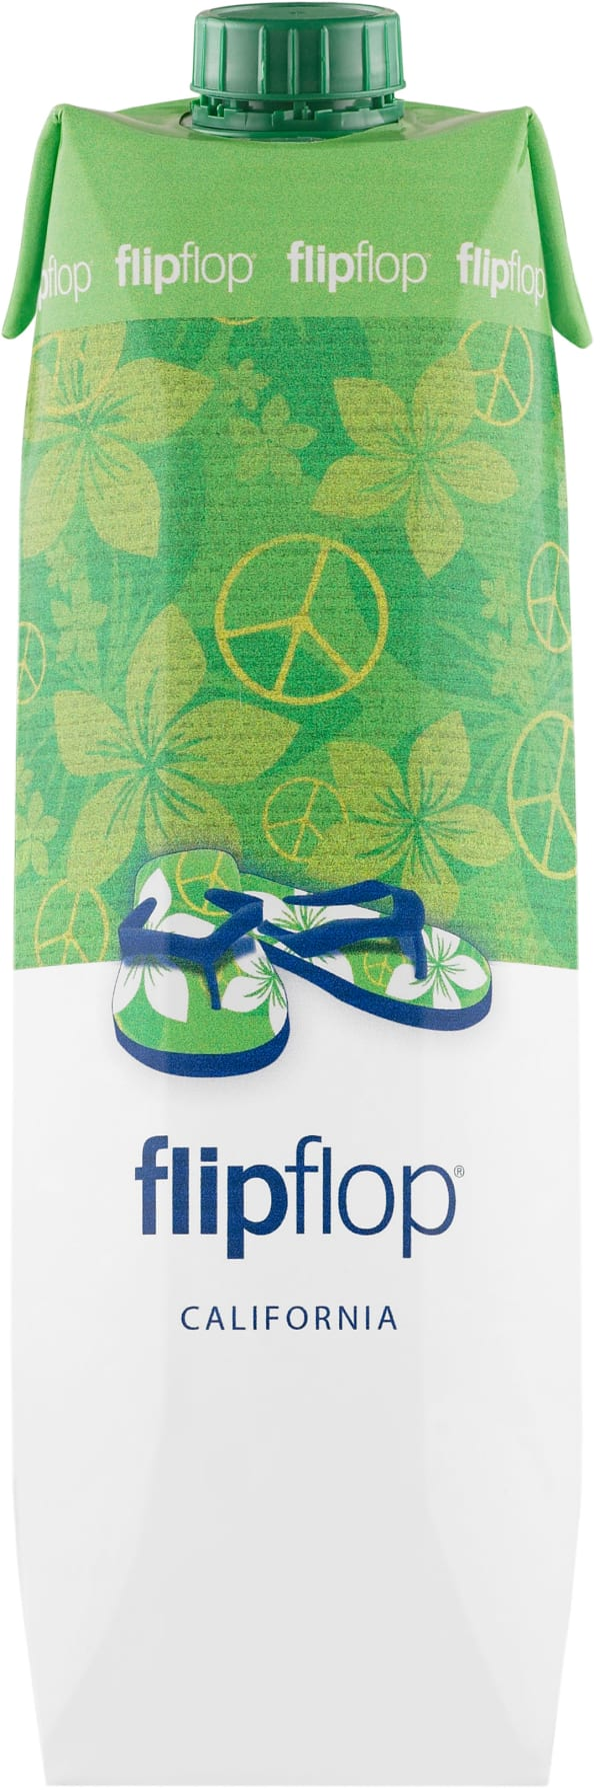 FlipFlop Californian White 2018 carton package